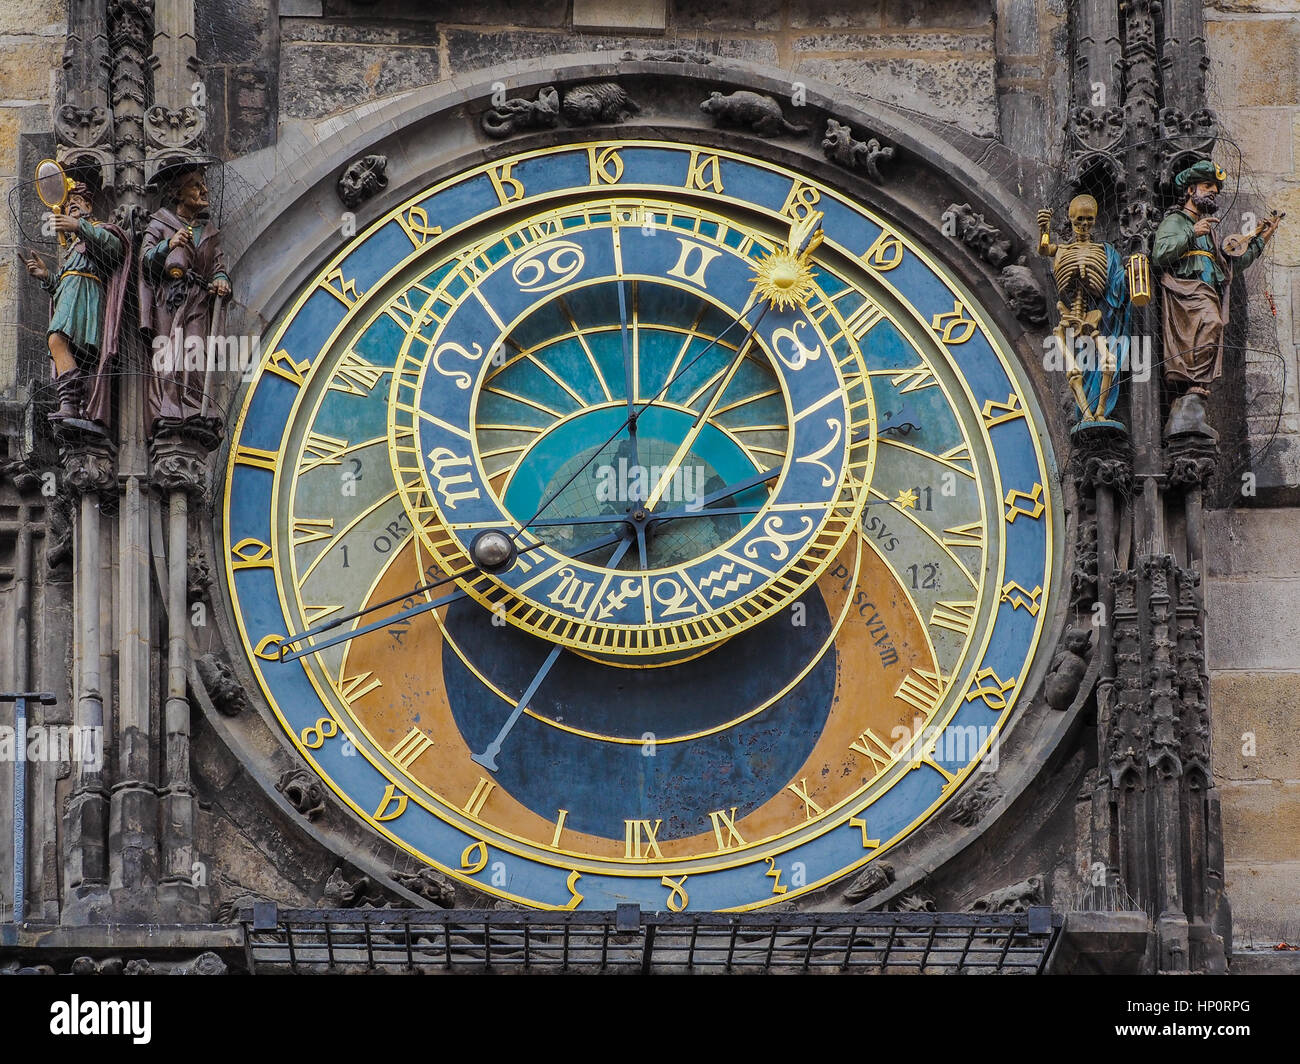 Closeup of the astronomic clock at the town hall of Prague, Czech Republic - Stock Image